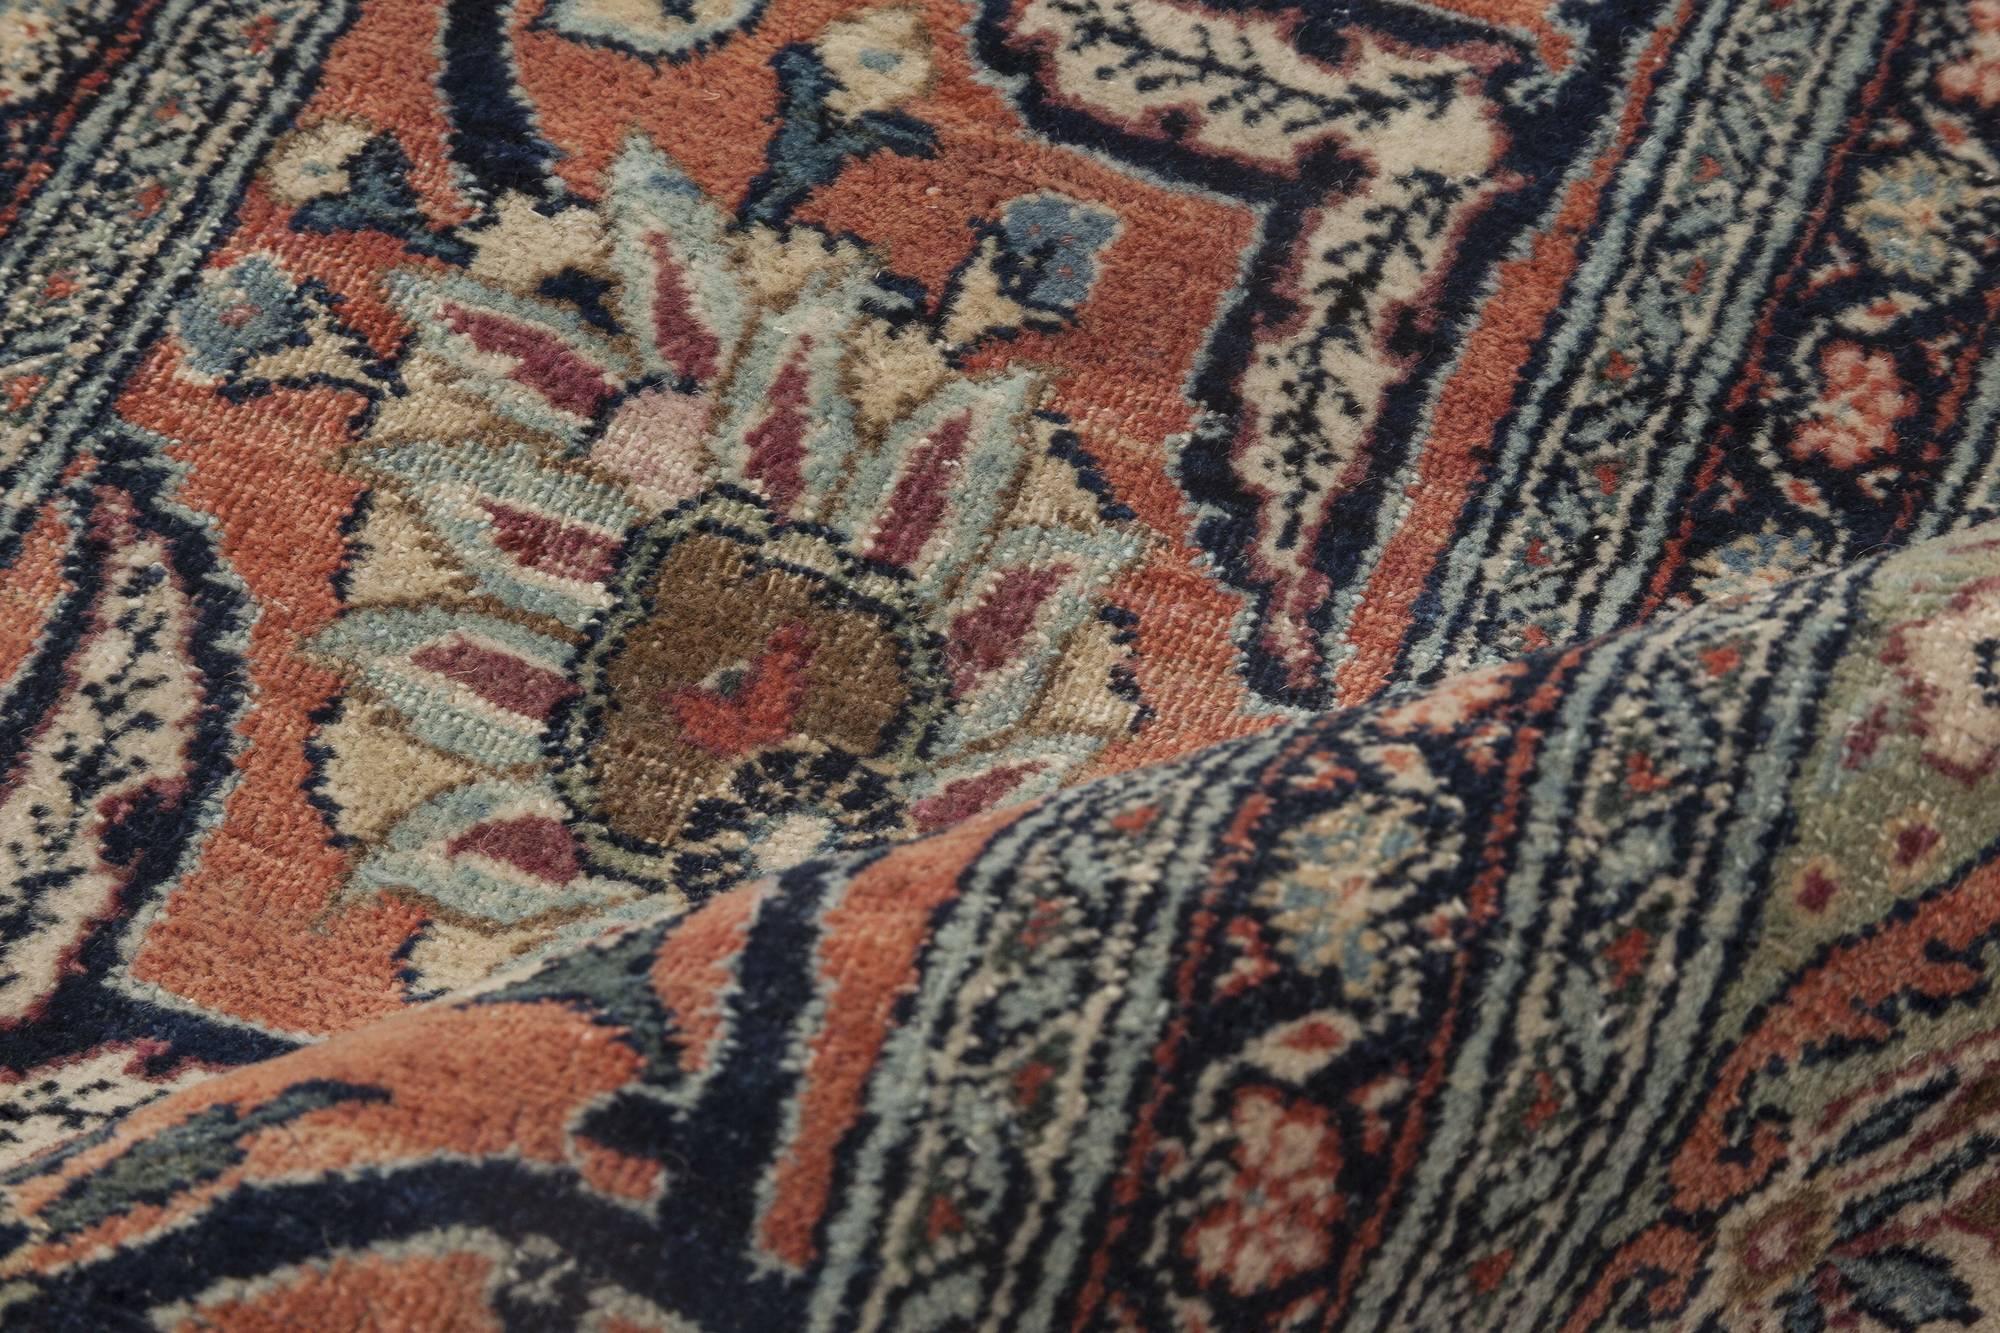 Large Antique Persian Tabriz Rug Bb4493 By Doris Leslie Blau